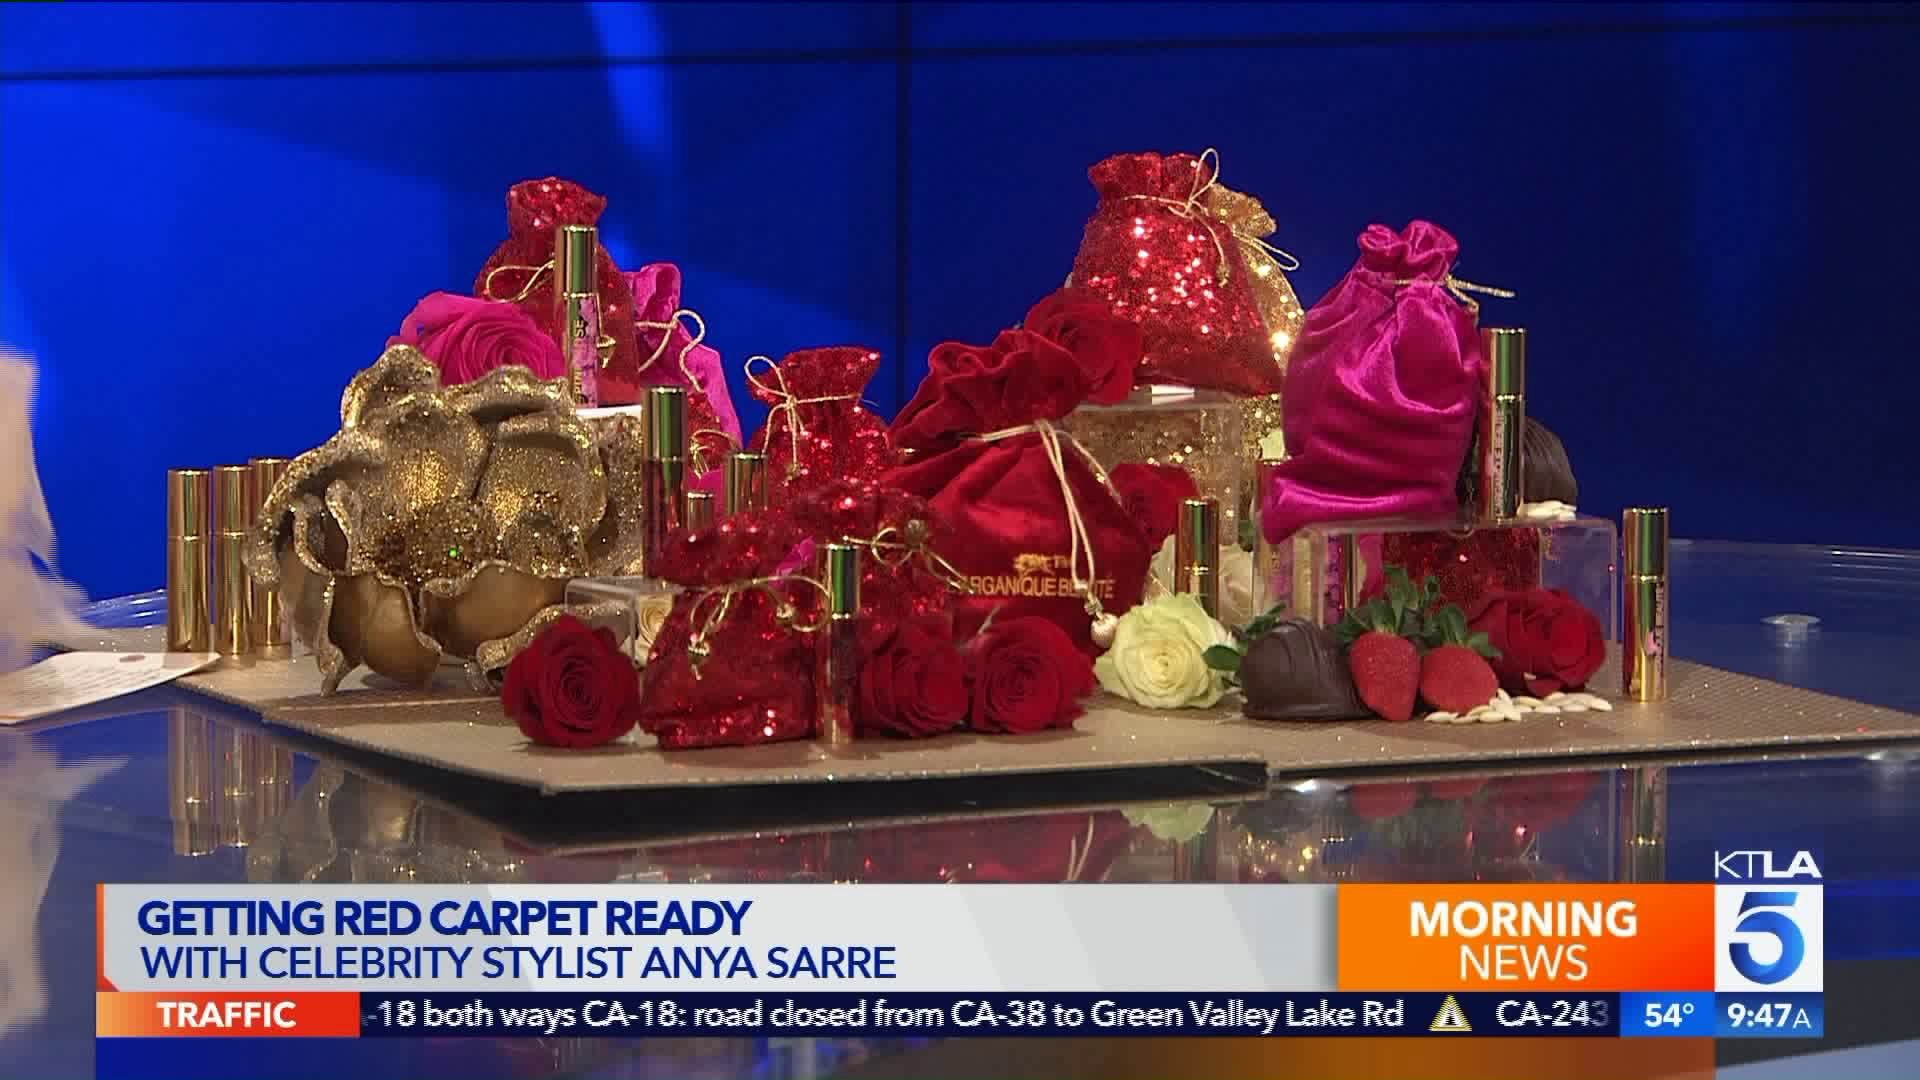 Getting Red Carpet Ready With Celebrity Stylist Anya Sarre Sunday Ktla